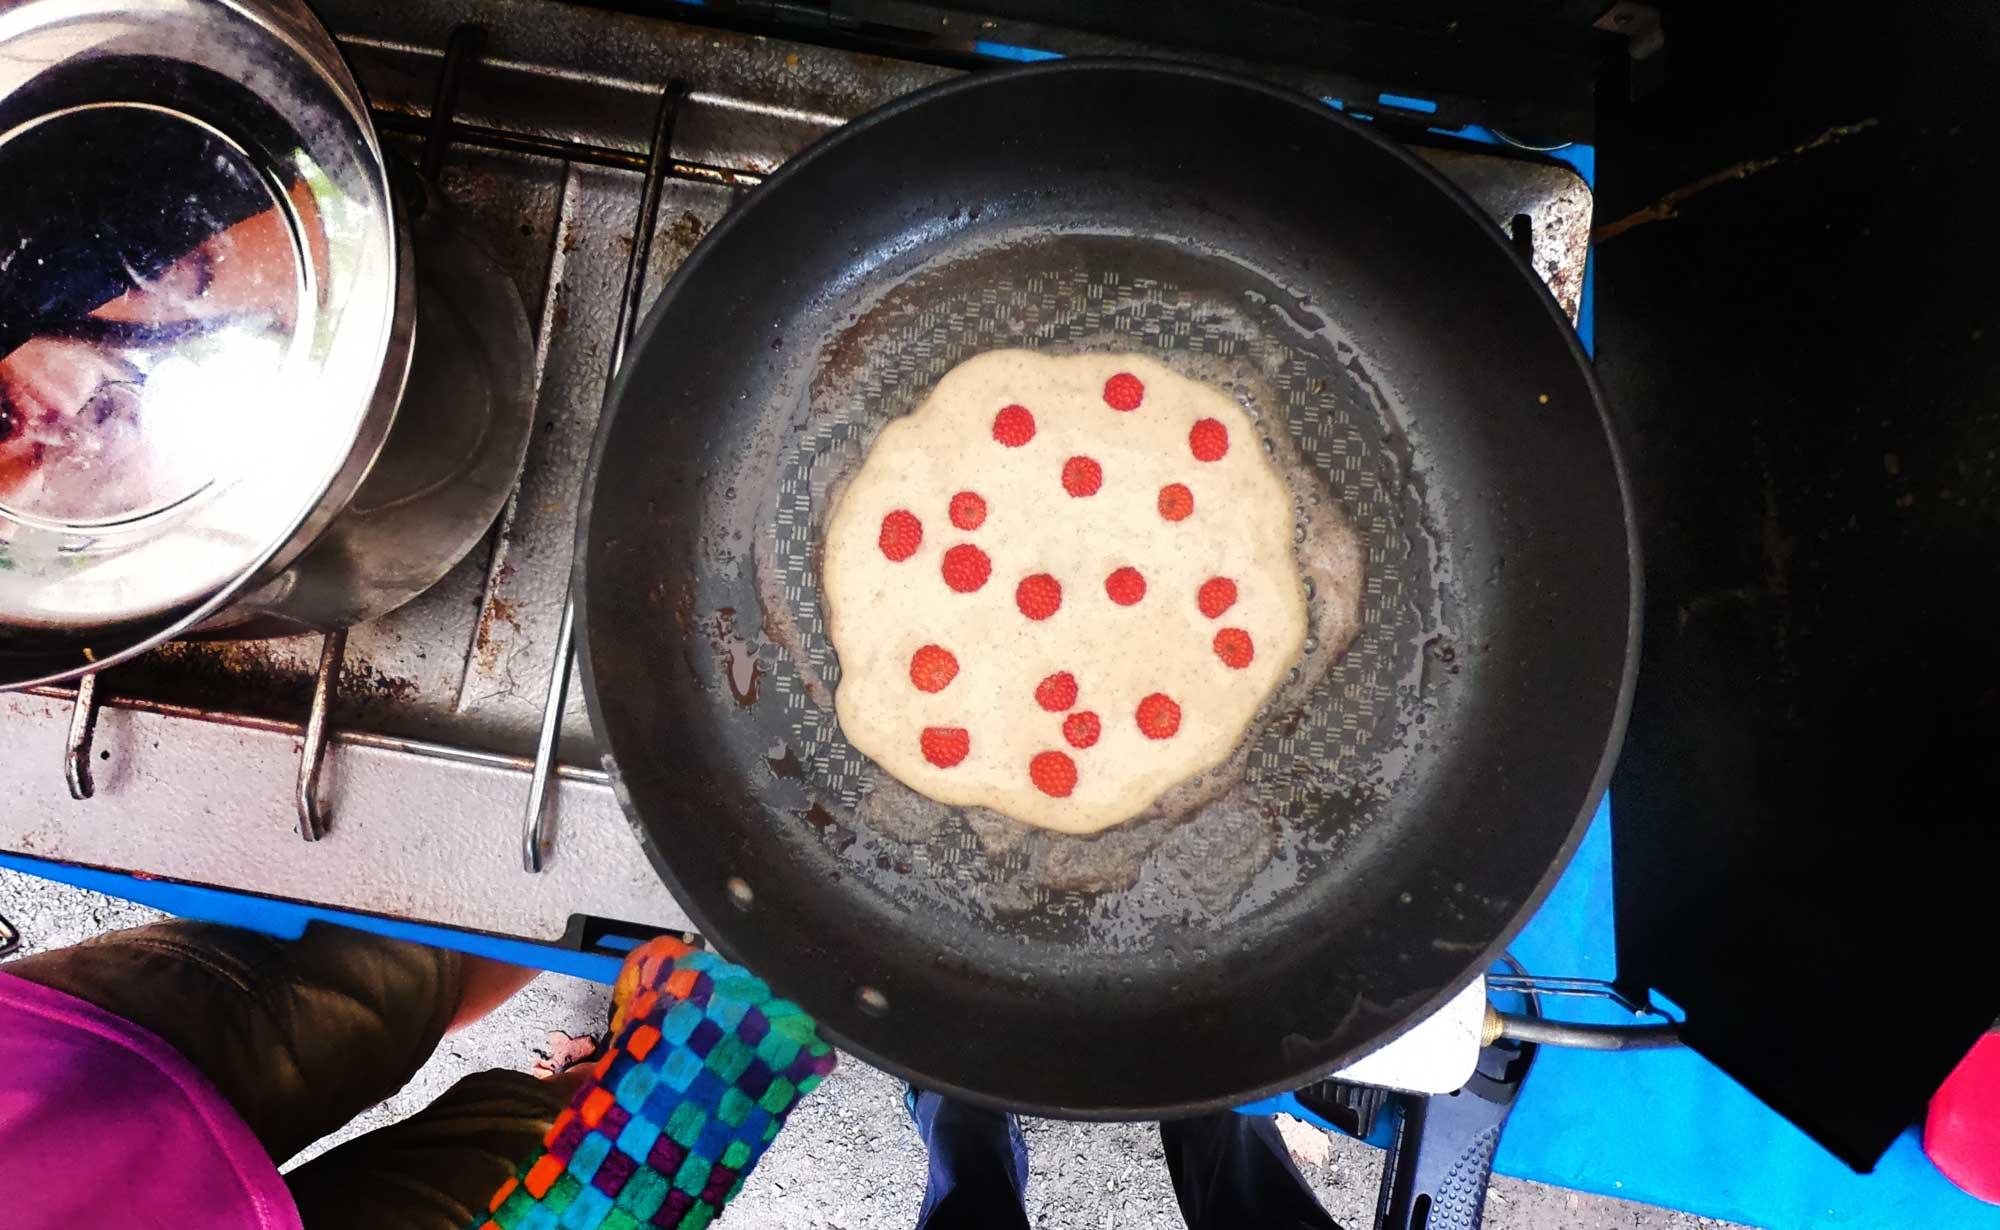 Wild-picked raspberries pancakes at Davidson River Campground, North Carolina